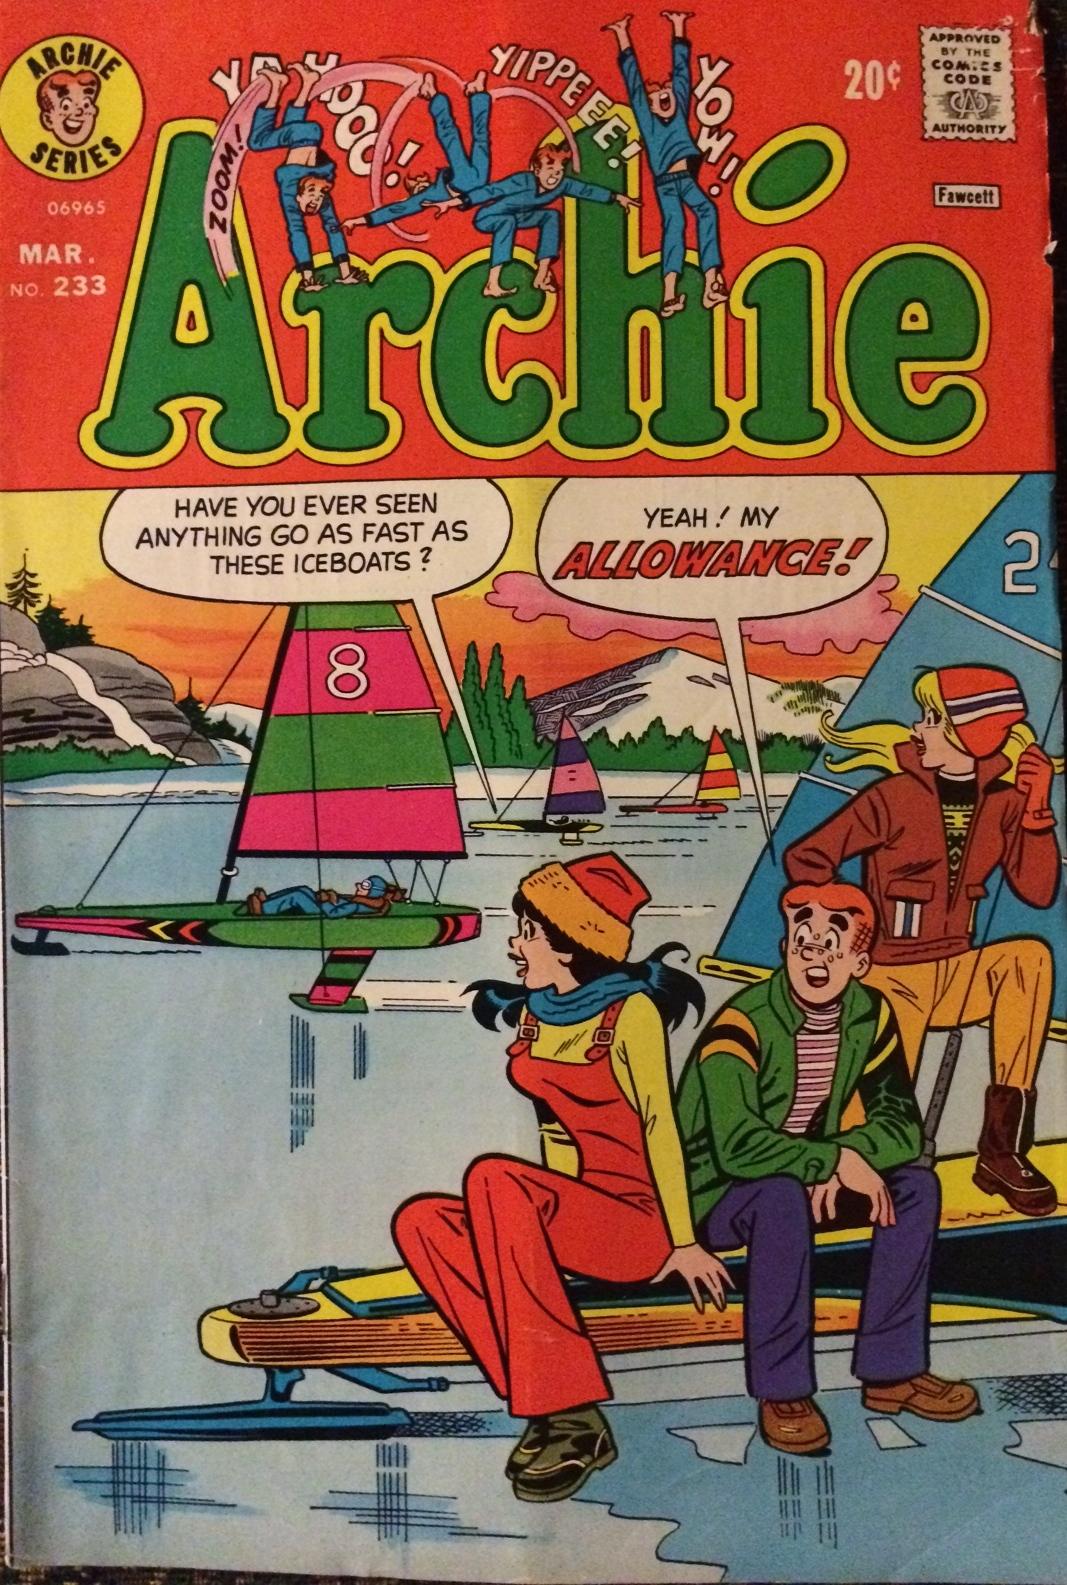 Archie's Back!